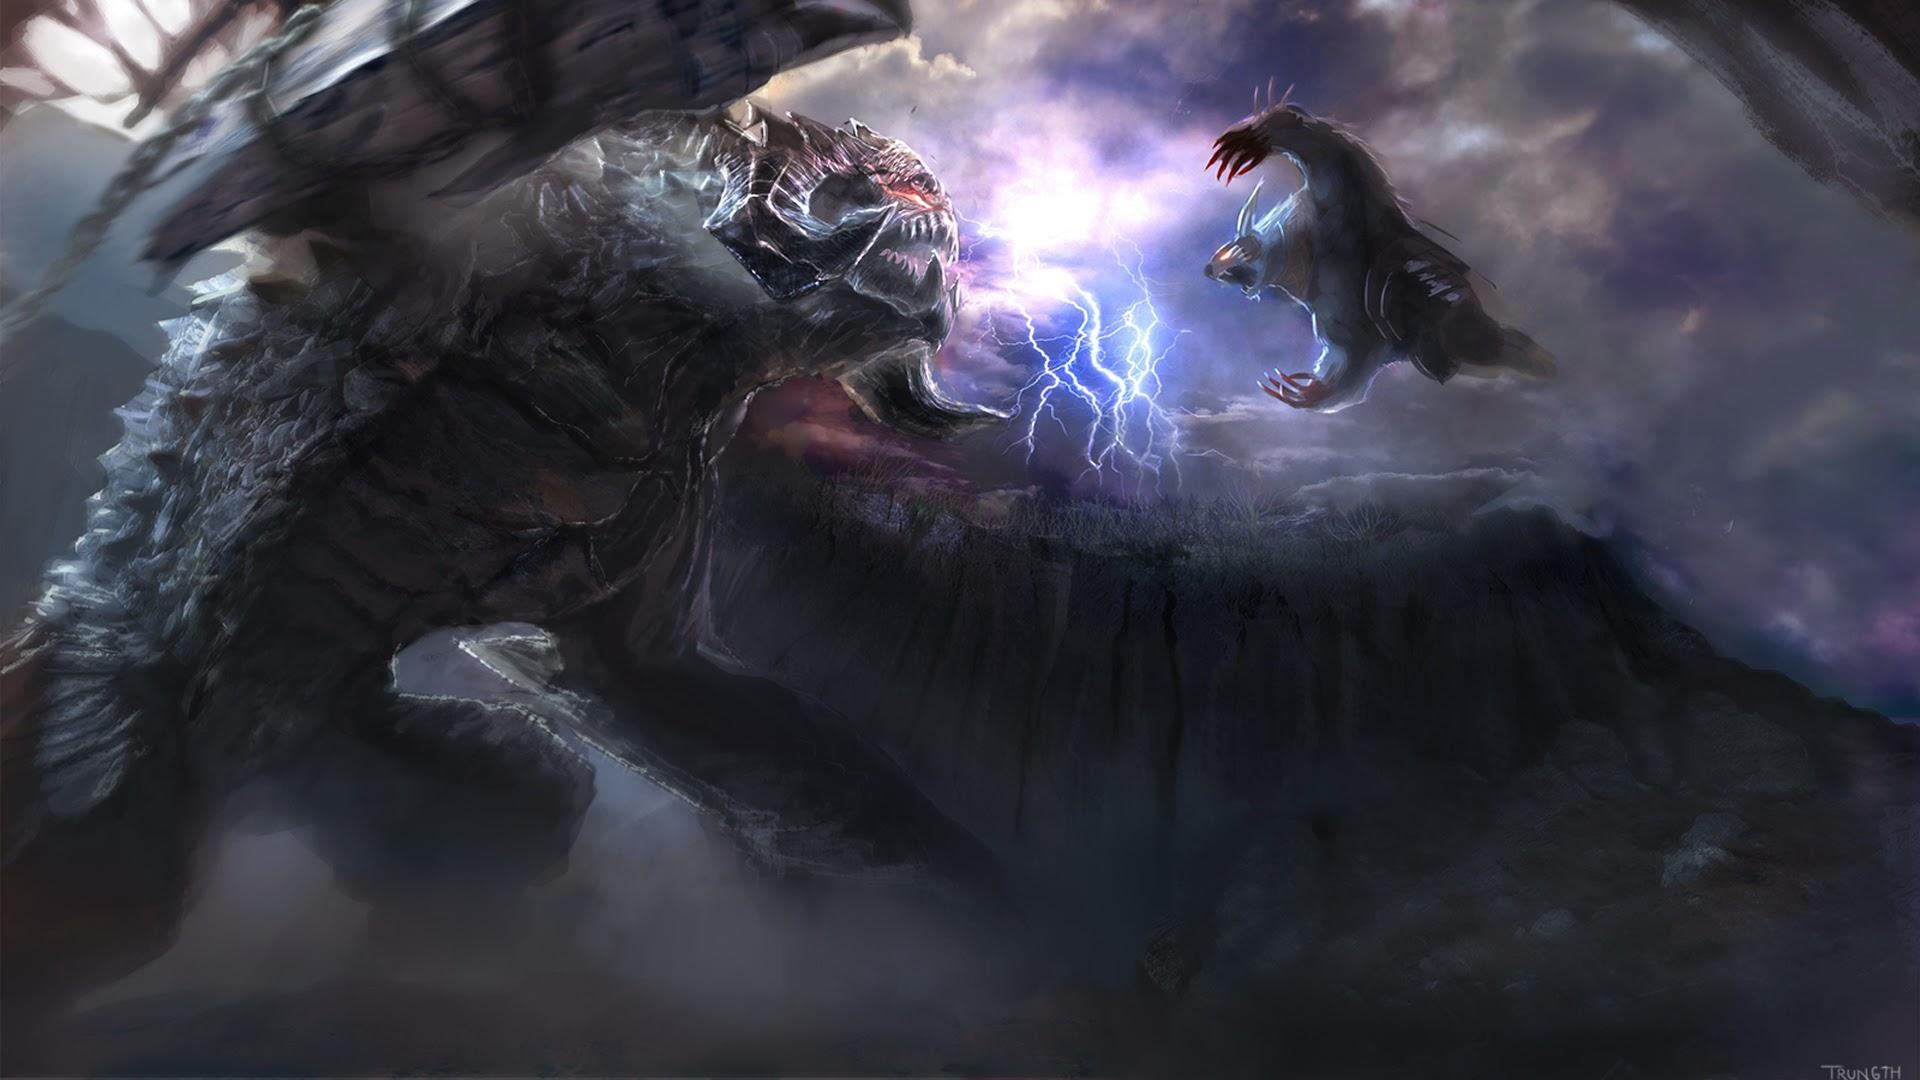 Roshan vs Ursa Dota 2 Clash Fight 18 Wallpaper HD